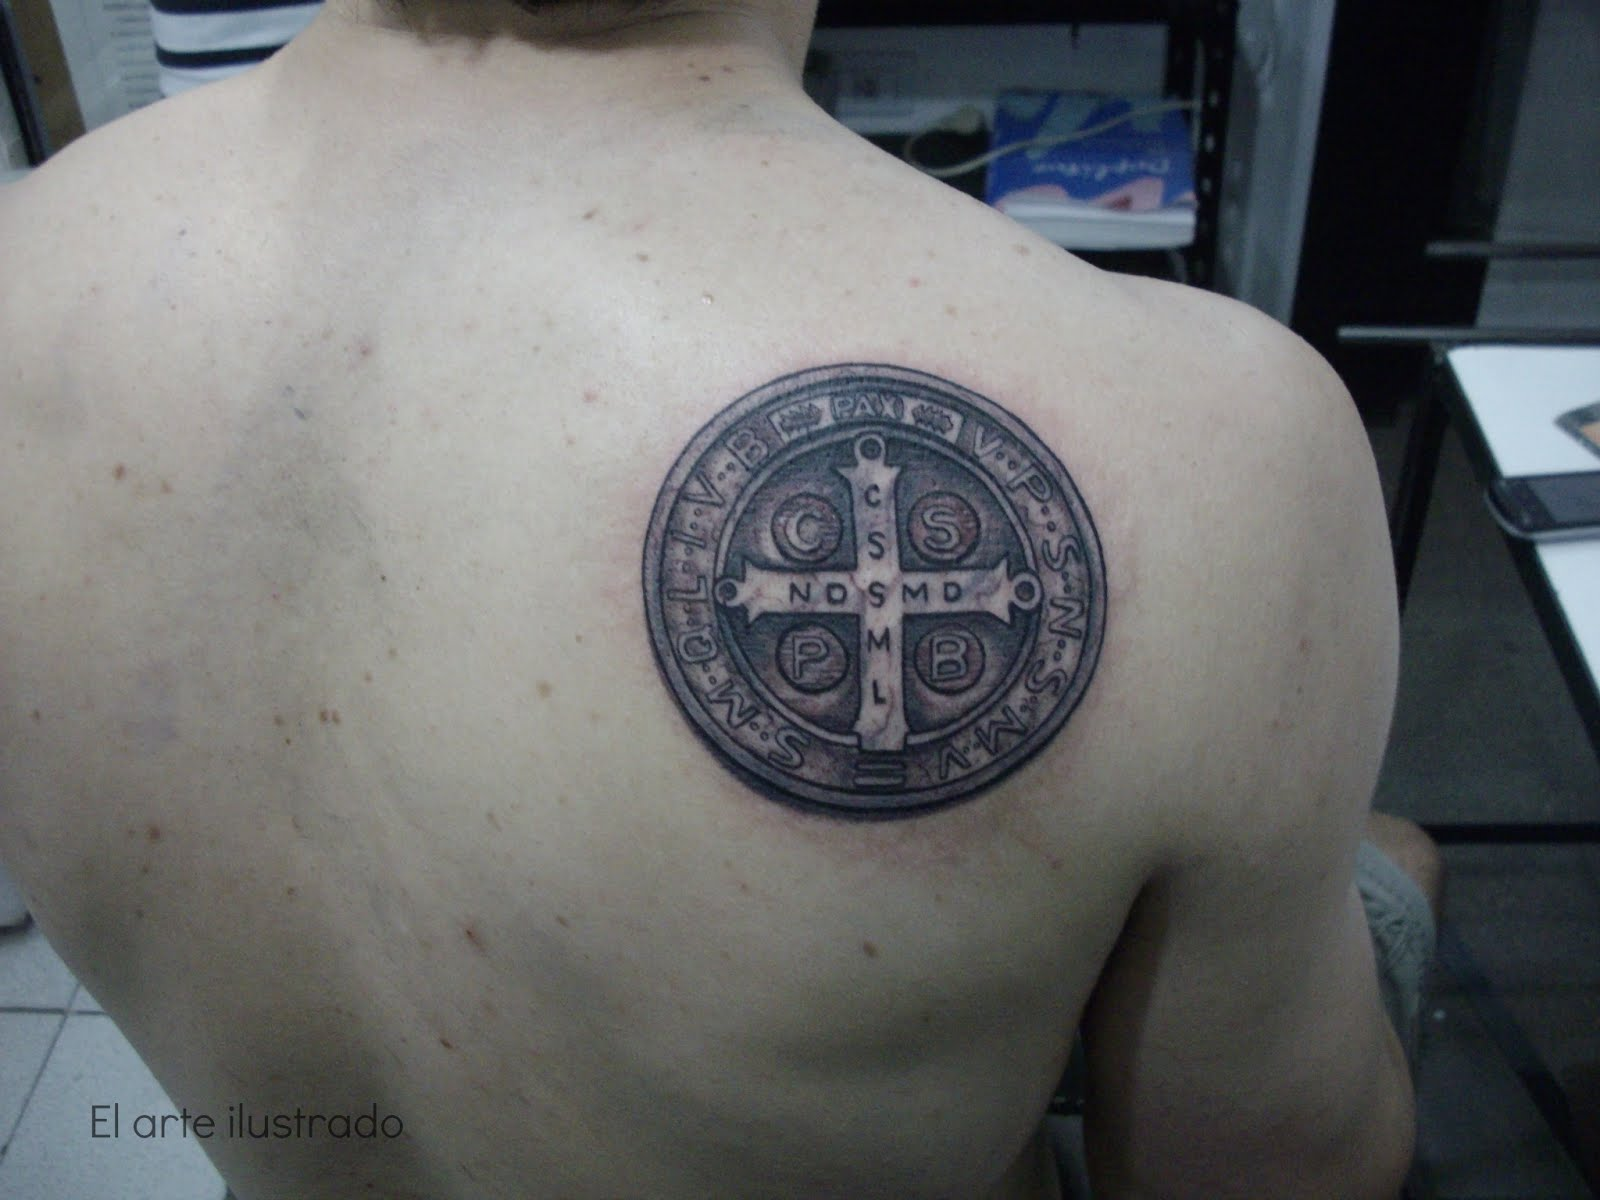 Tatuajes De Rosas Para La Espalda en Pinterest | Tatuajes, Tatuaje